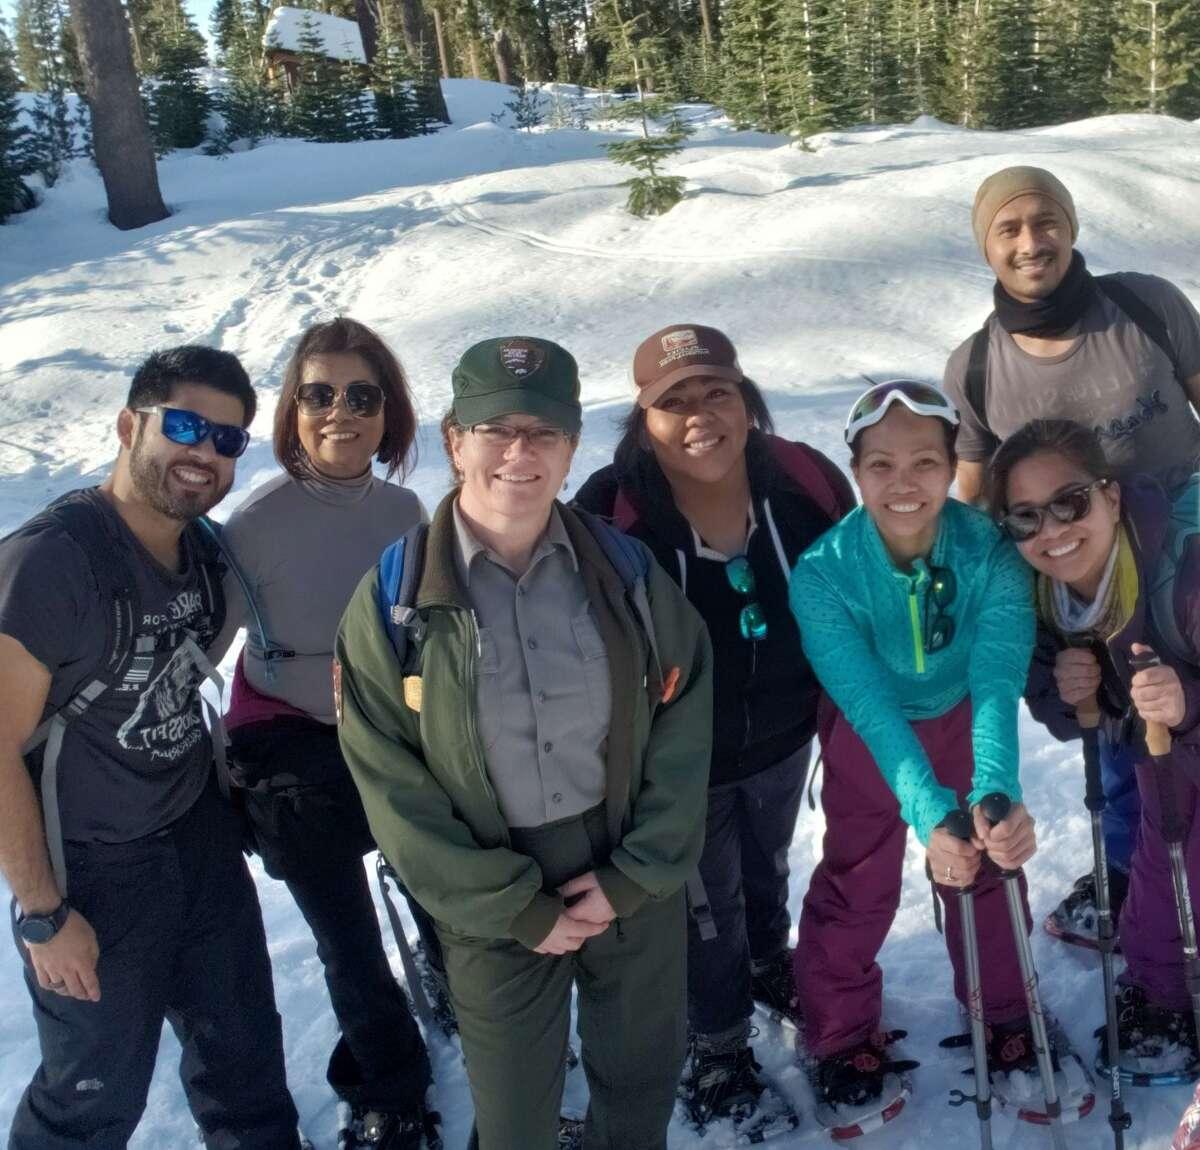 Park ranger Shanda Ochs and group of snowshoe walk participants outside of the Kohm yah-mah-nee Visitor Center.